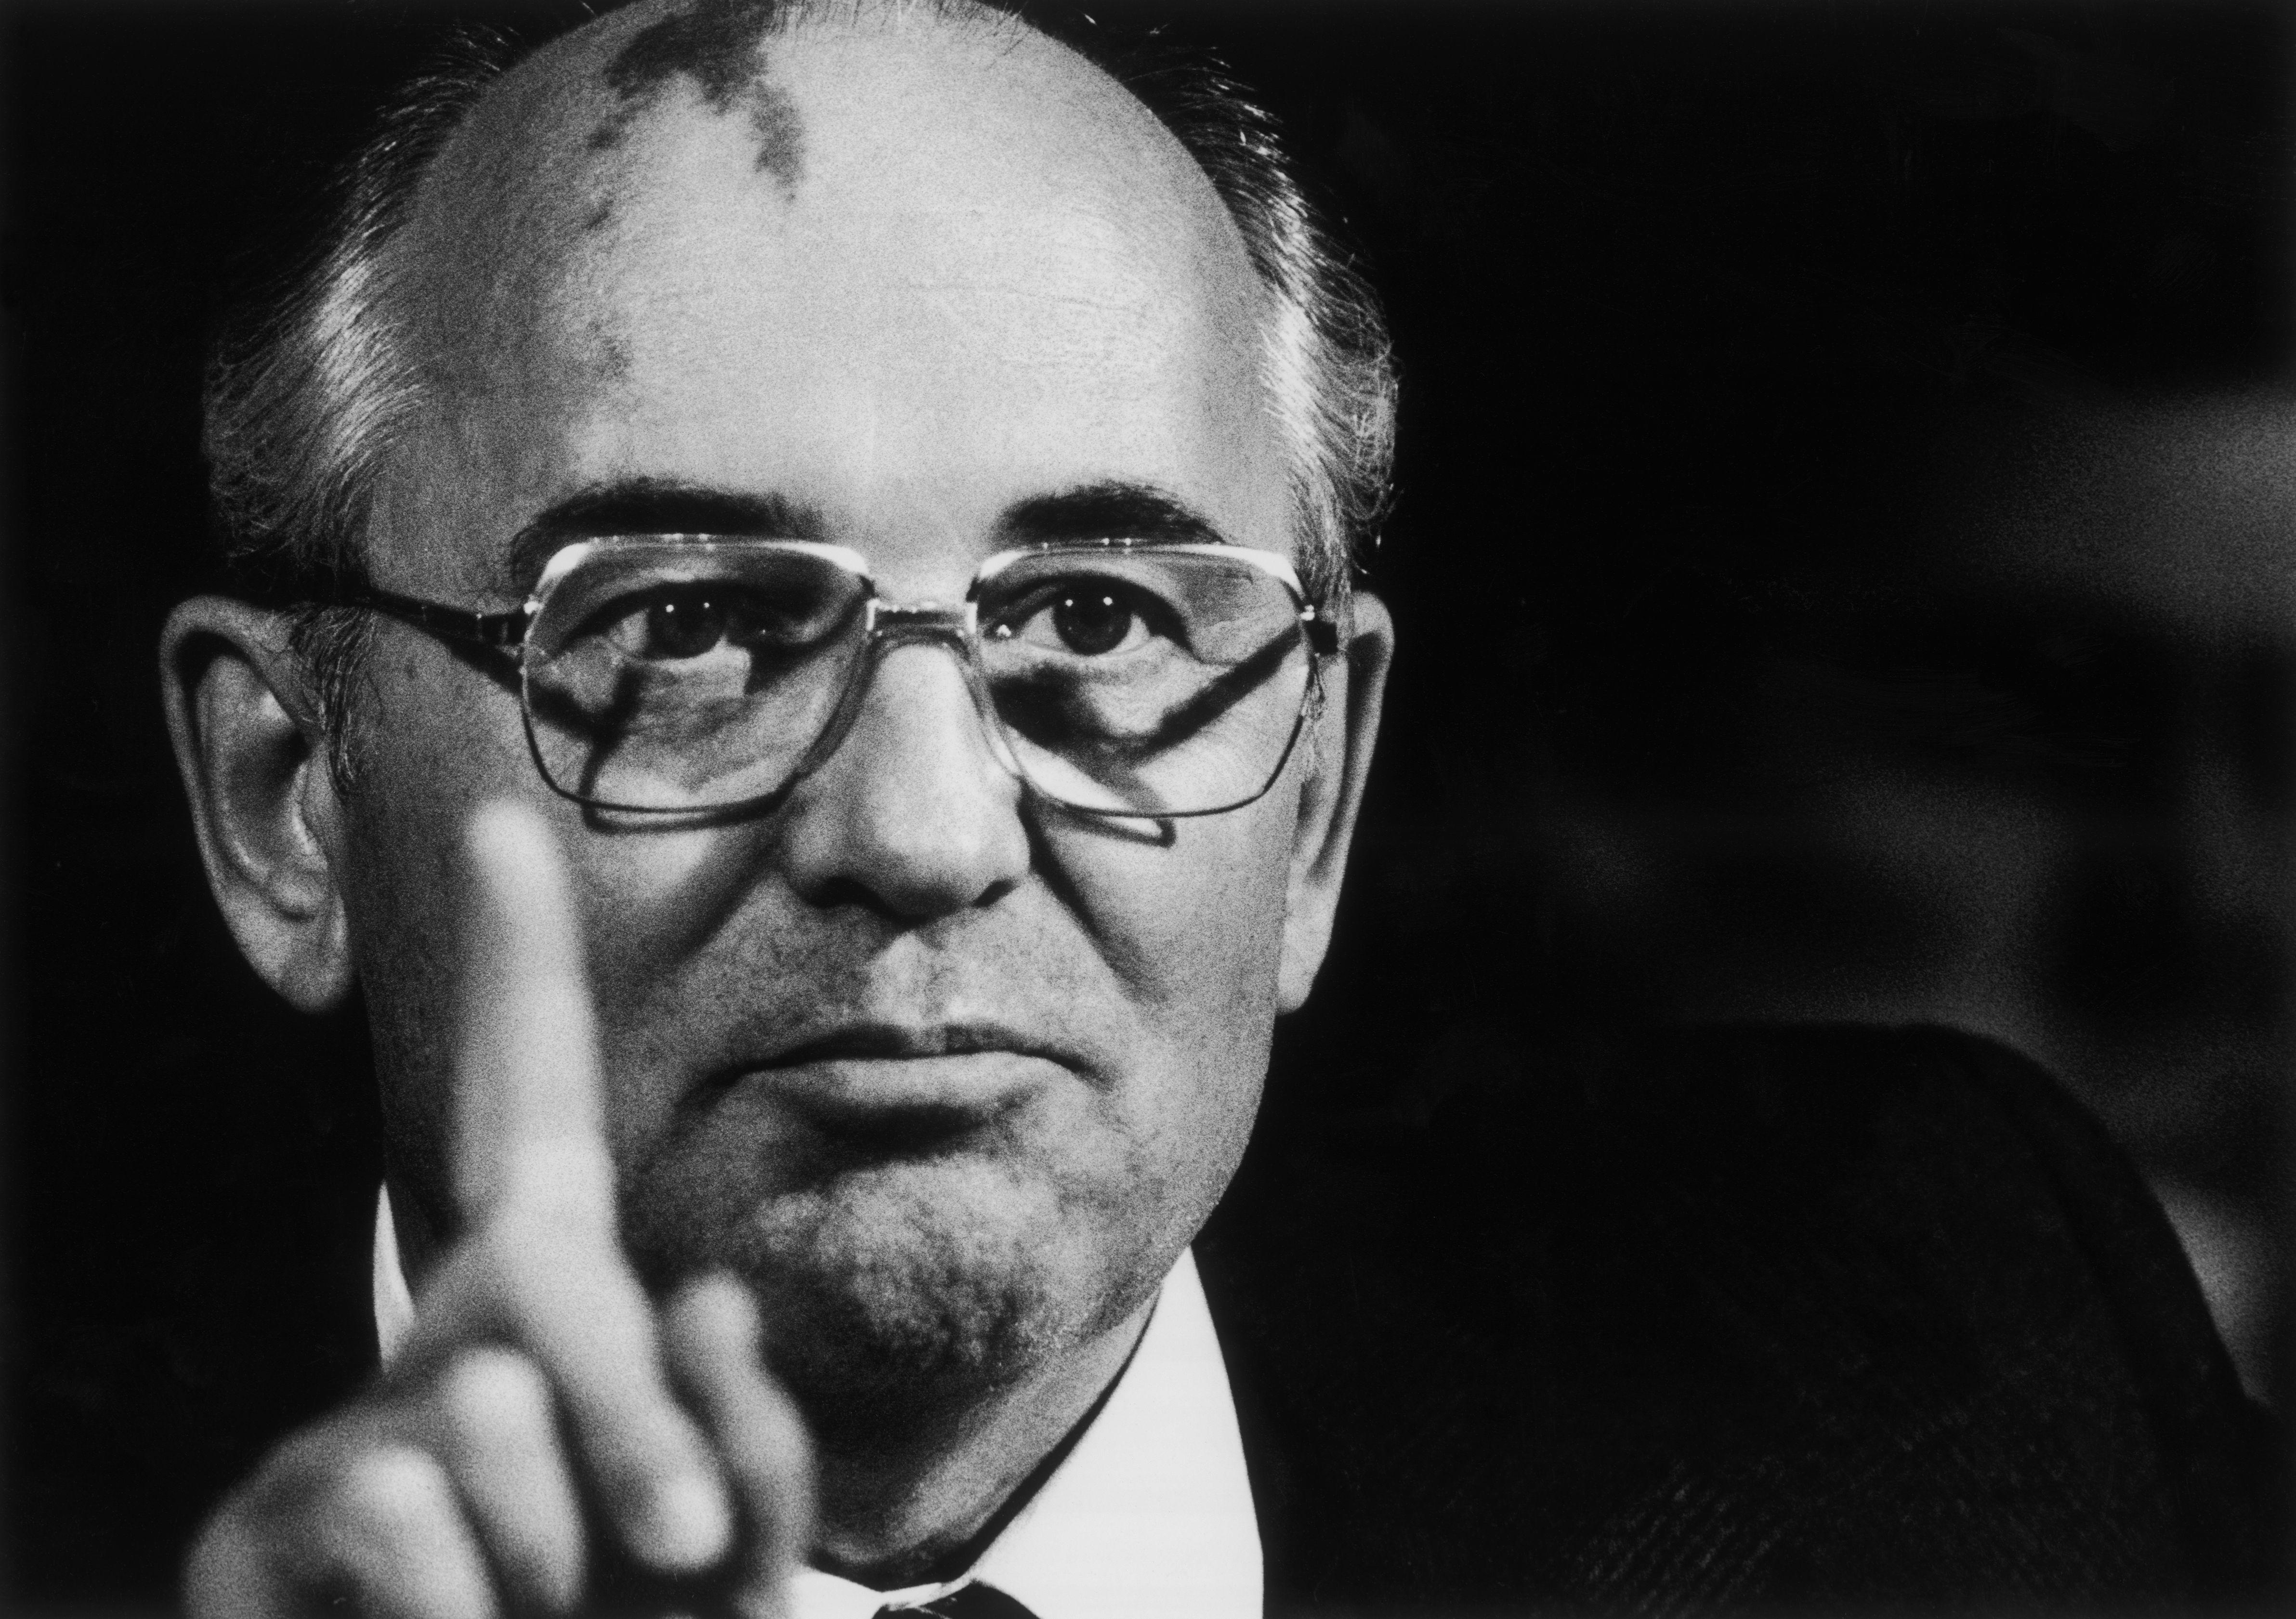 Mikhail Gorbachev pointing upwards in Iceland